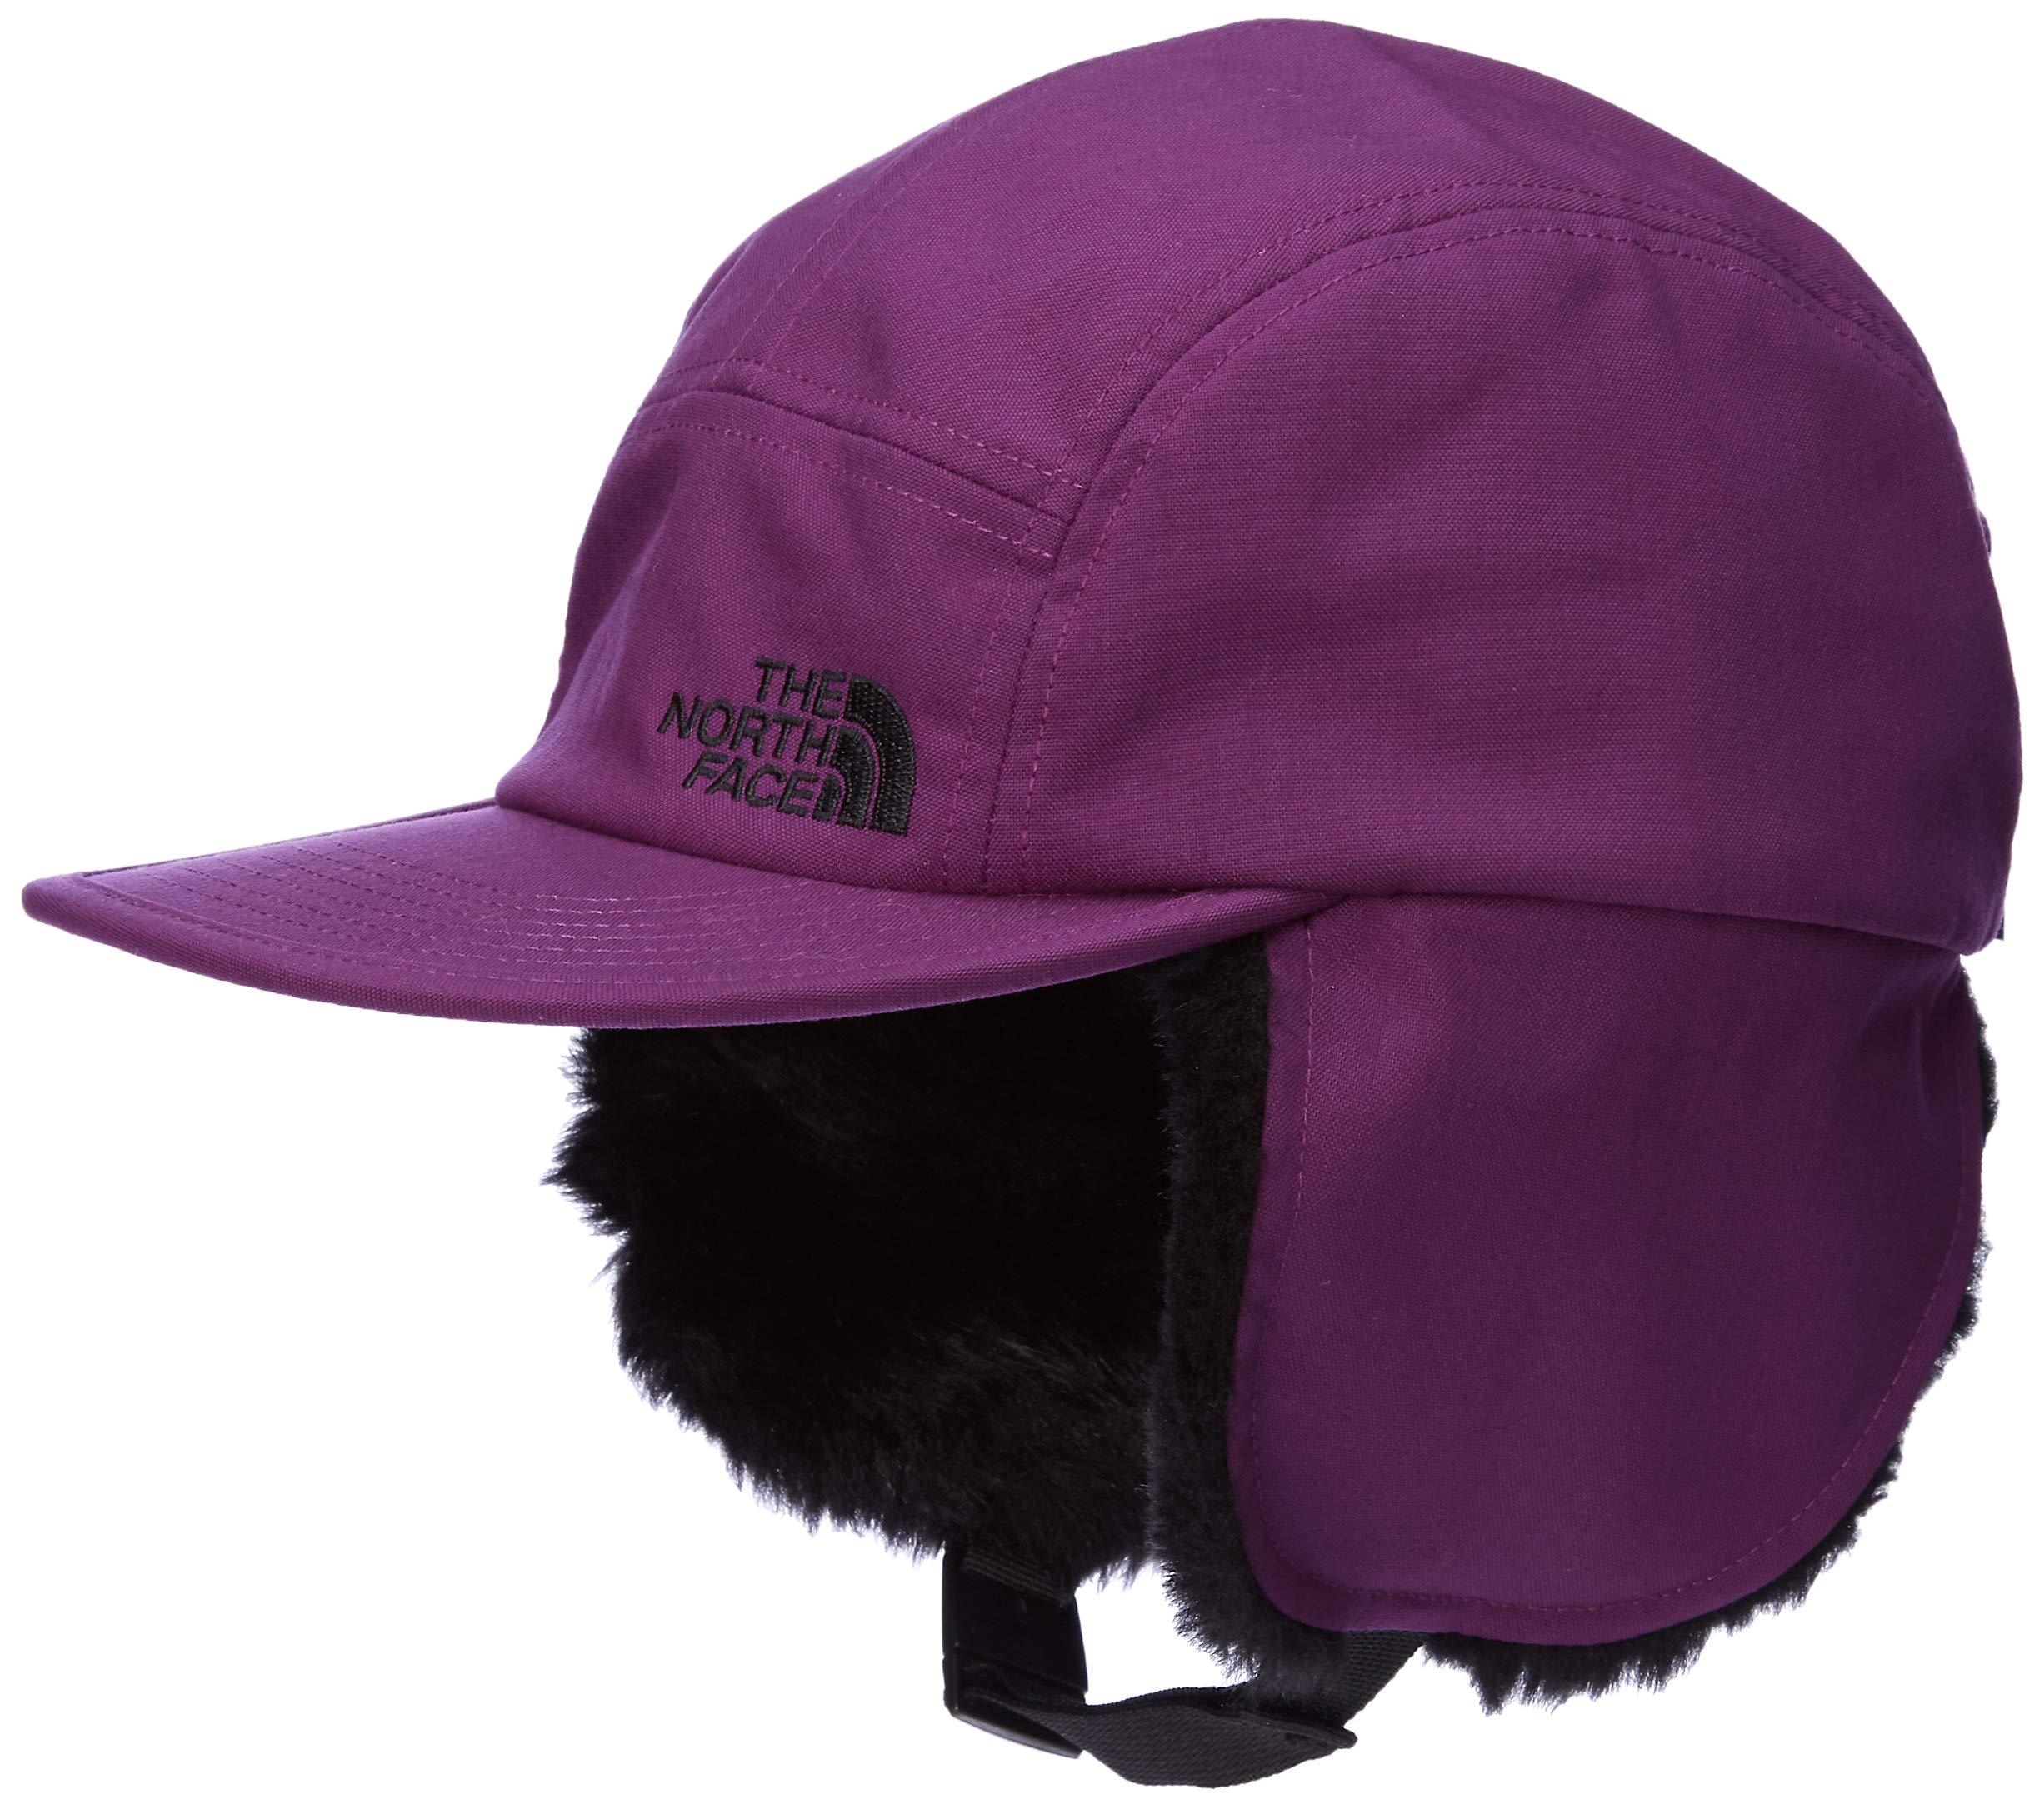 The North Face 北面 棒球帽 男女通用 浅口鞋 紫色 日本 L (日本サイズL相当)